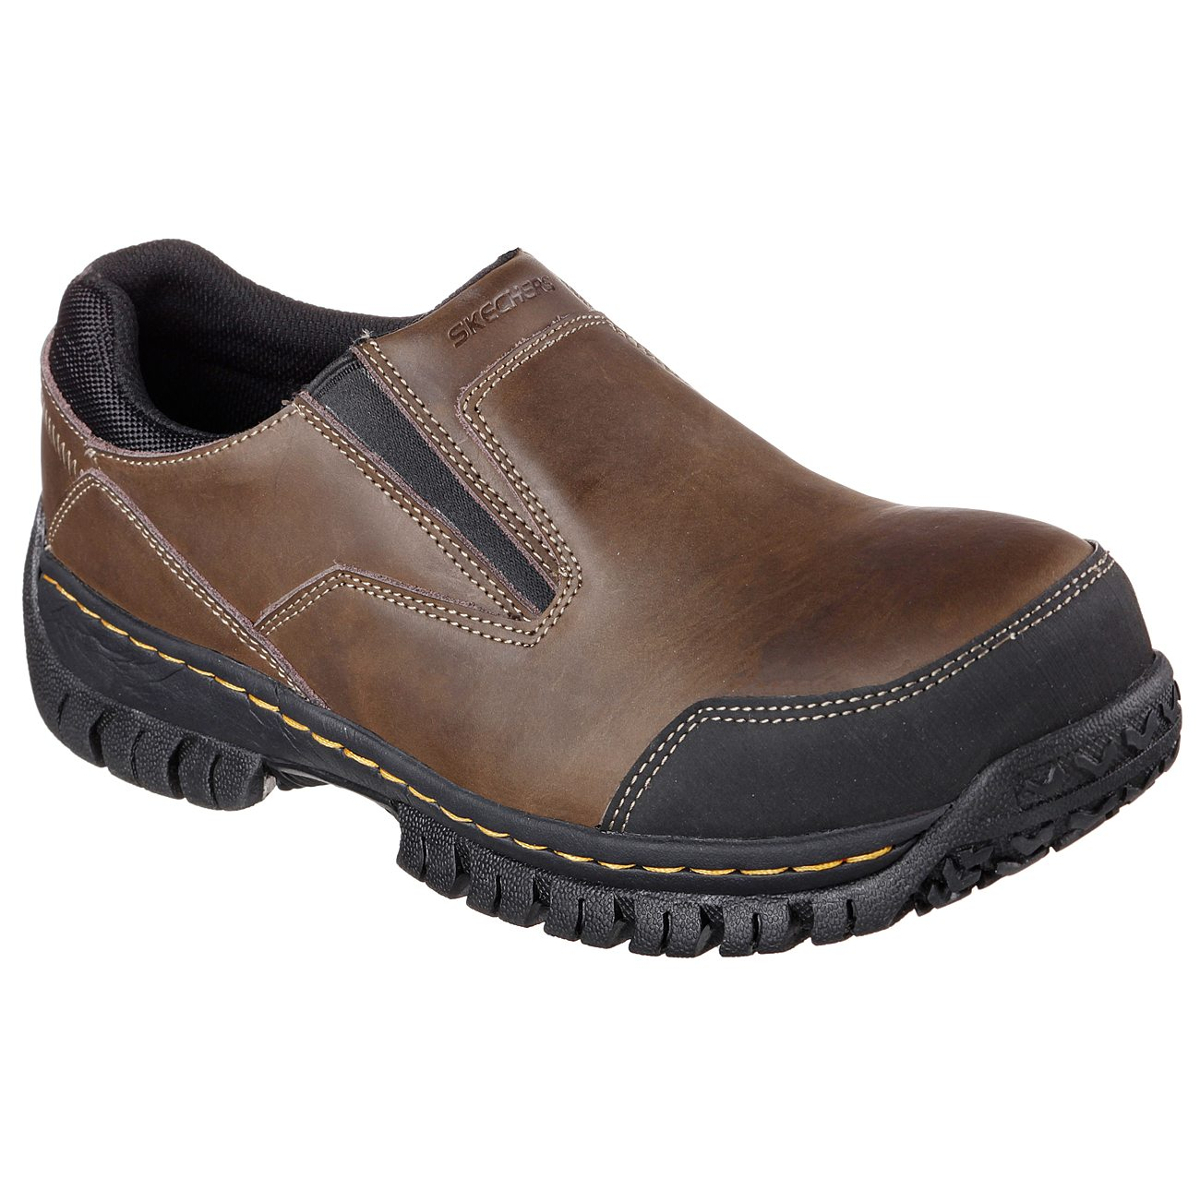 Skechers Men's Work Relaxed Fit: Hartan Steel Toe Work Shoes - Brown, 8.5